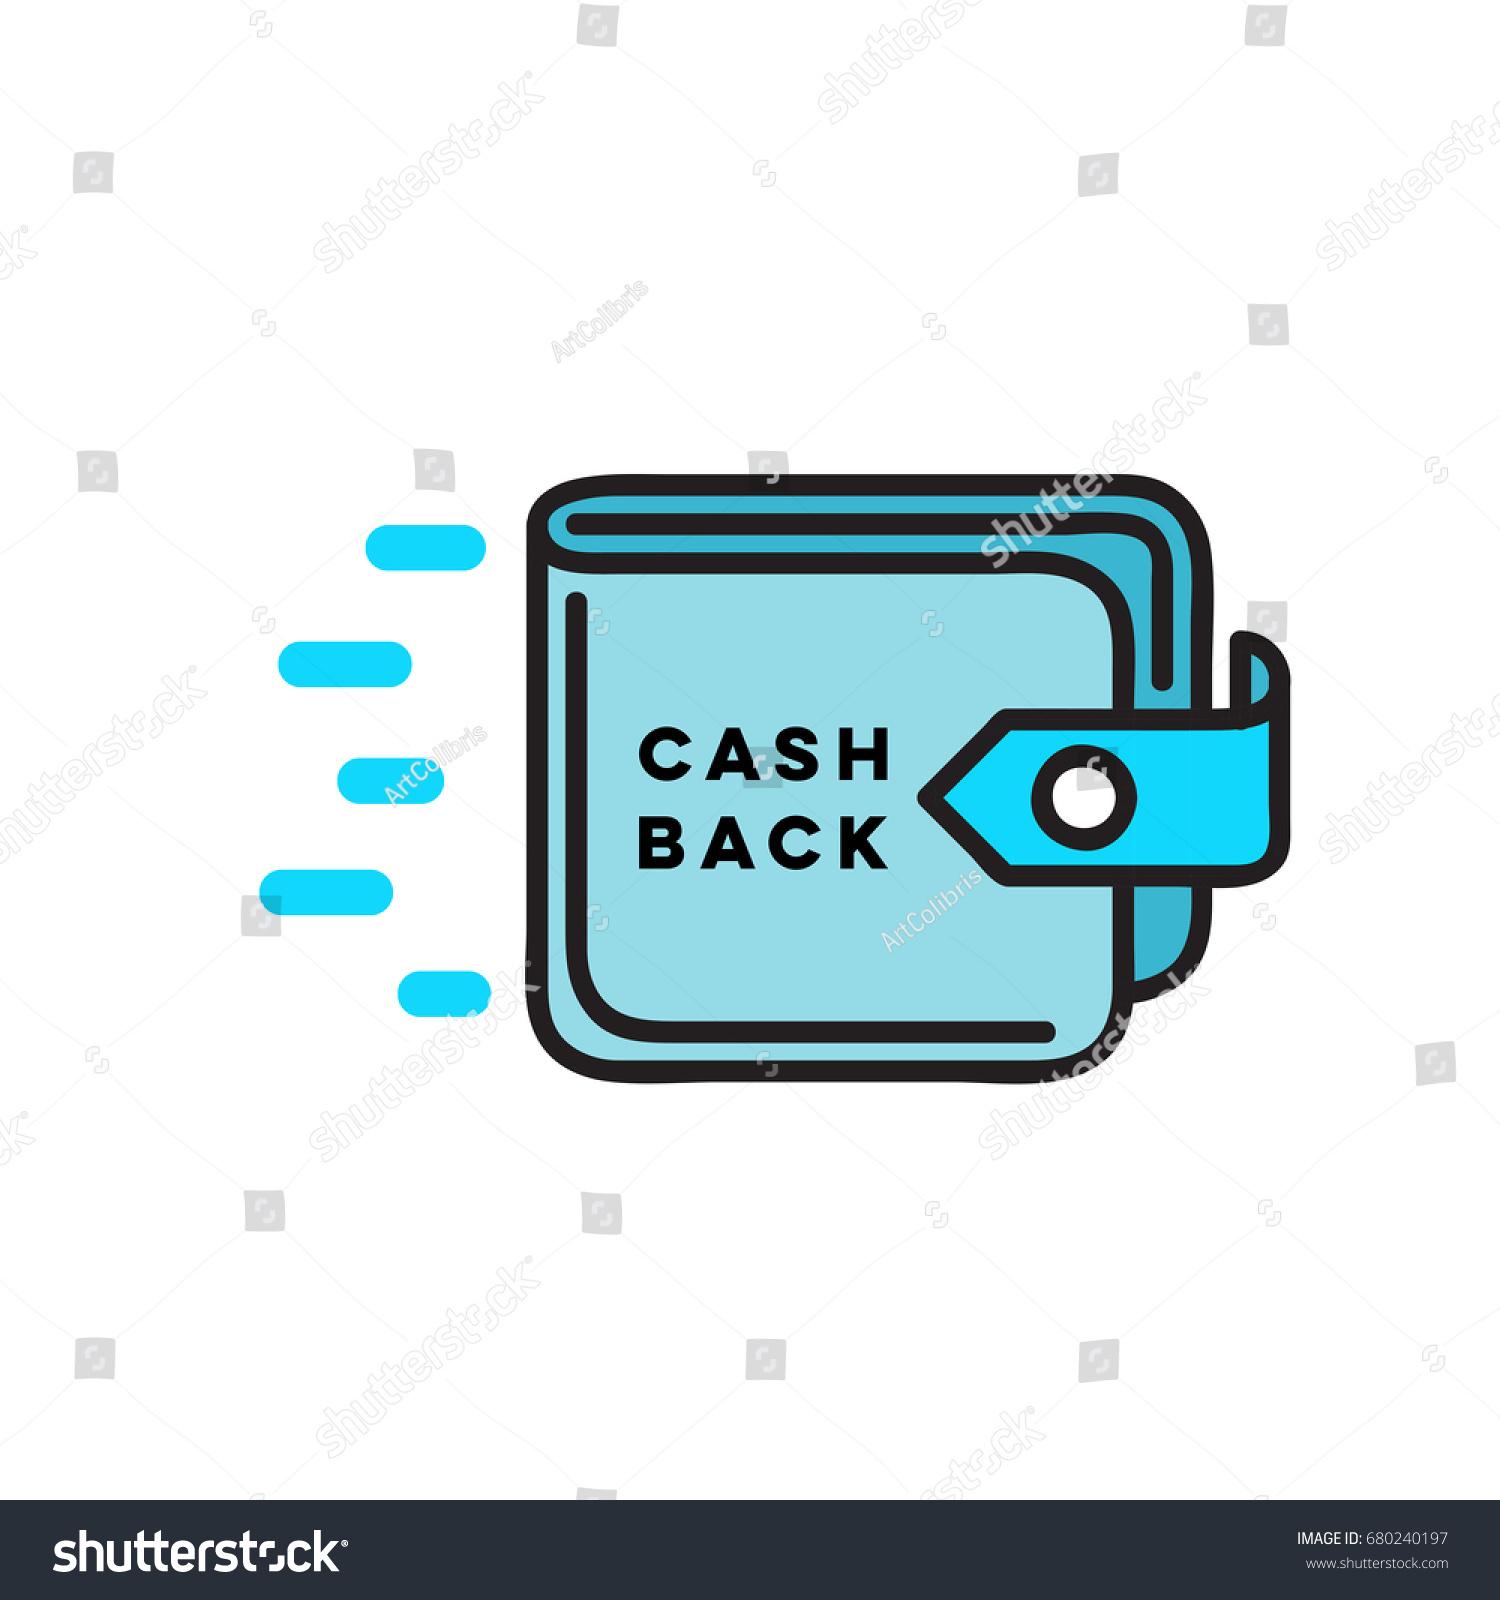 cash back flat linear wallet icon stock vector royalty free 680240197 https www shutterstock com image vector cash back flat linear wallet icon 680240197